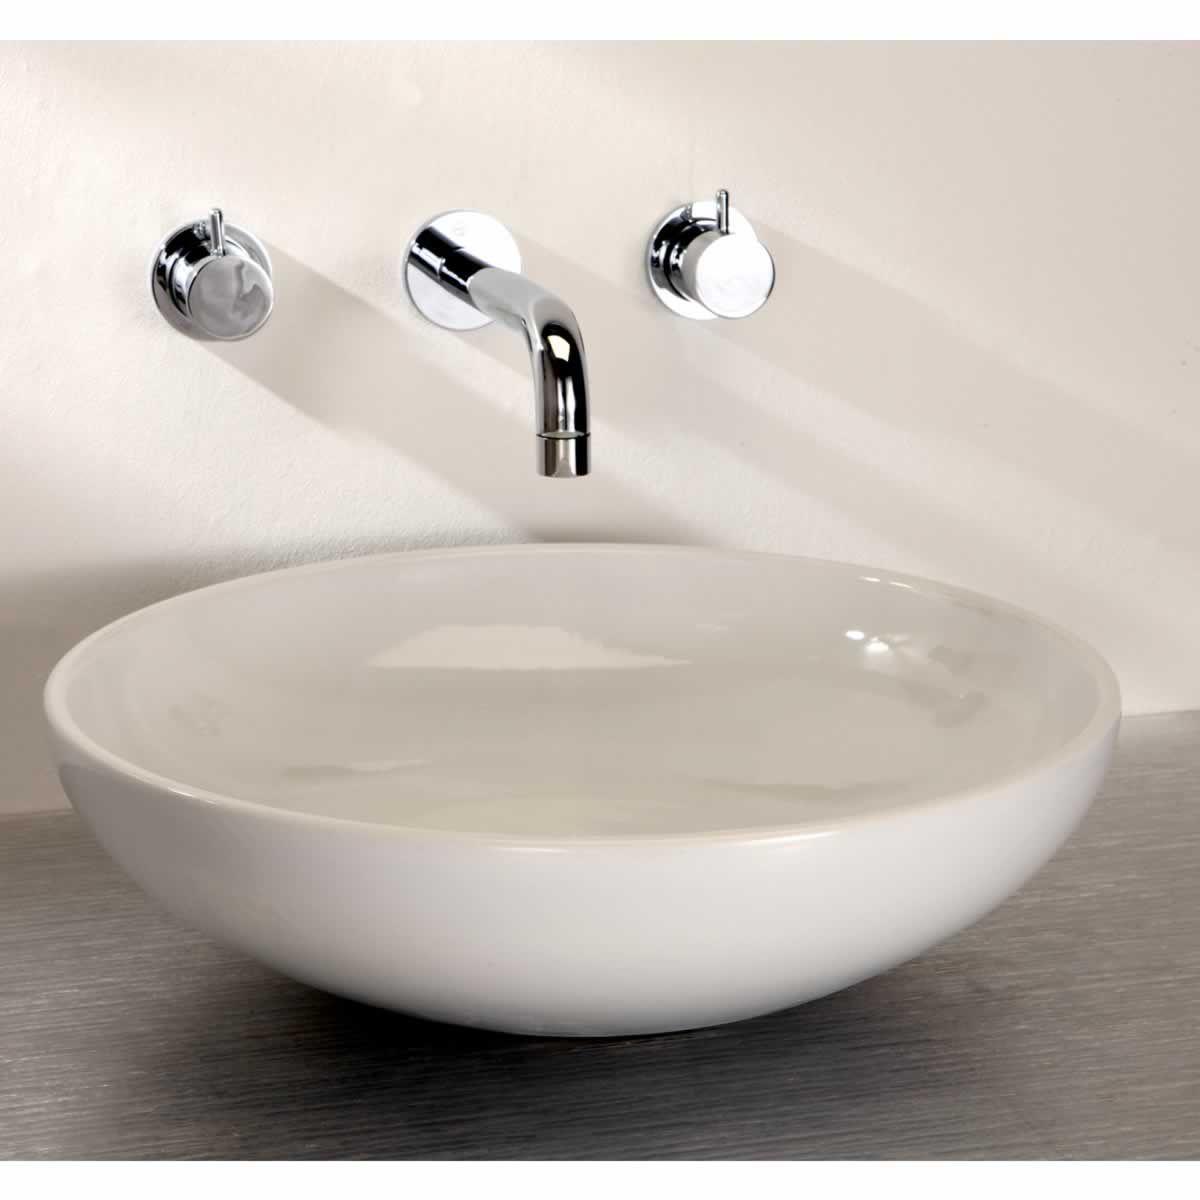 Finwood Designs Thin Tondo Round Bathroom Basin